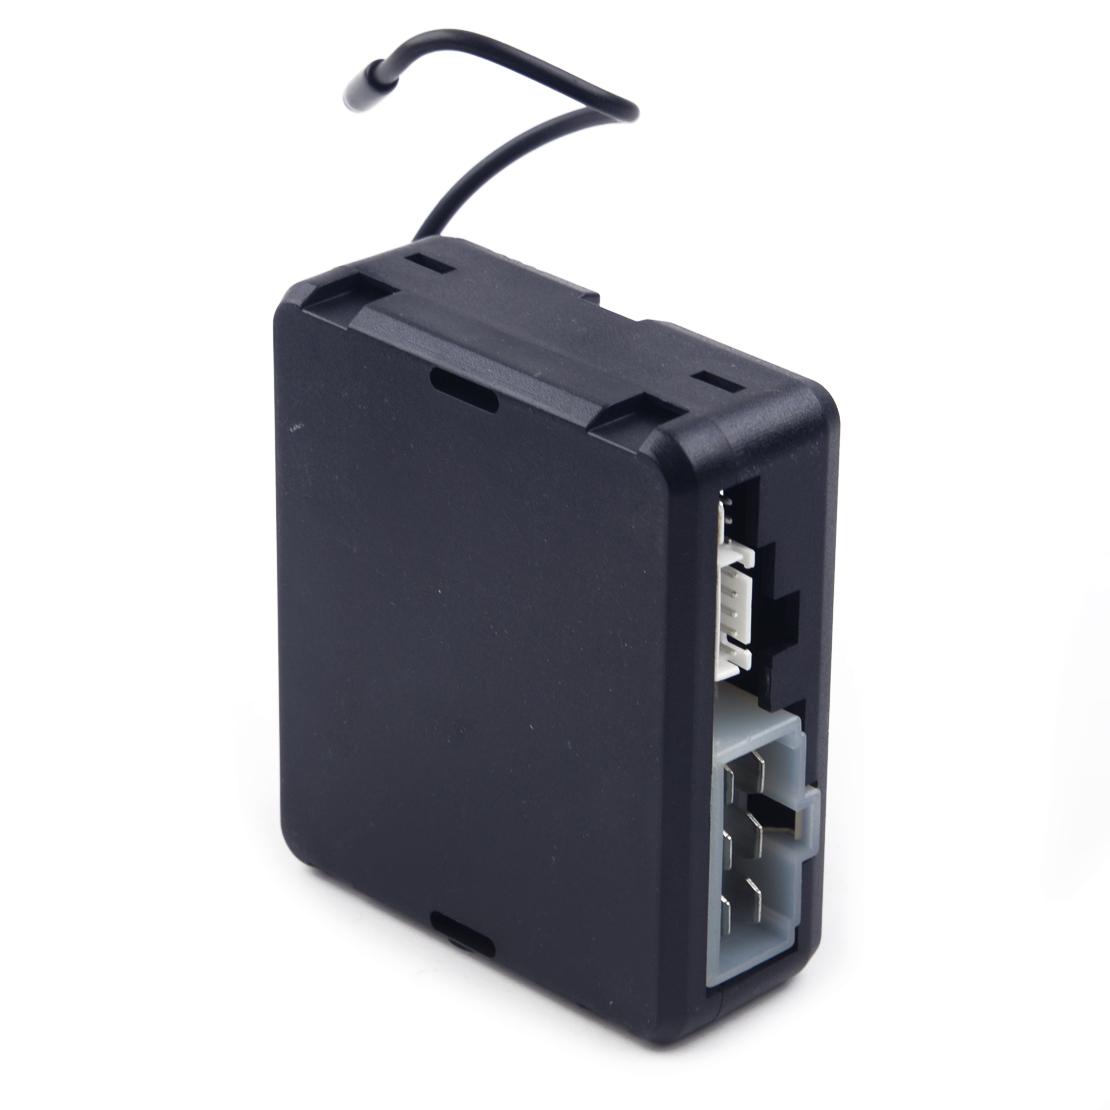 Arm Unlock Disarm Remote Car Starter Trunk Release Panic Or Car Finder